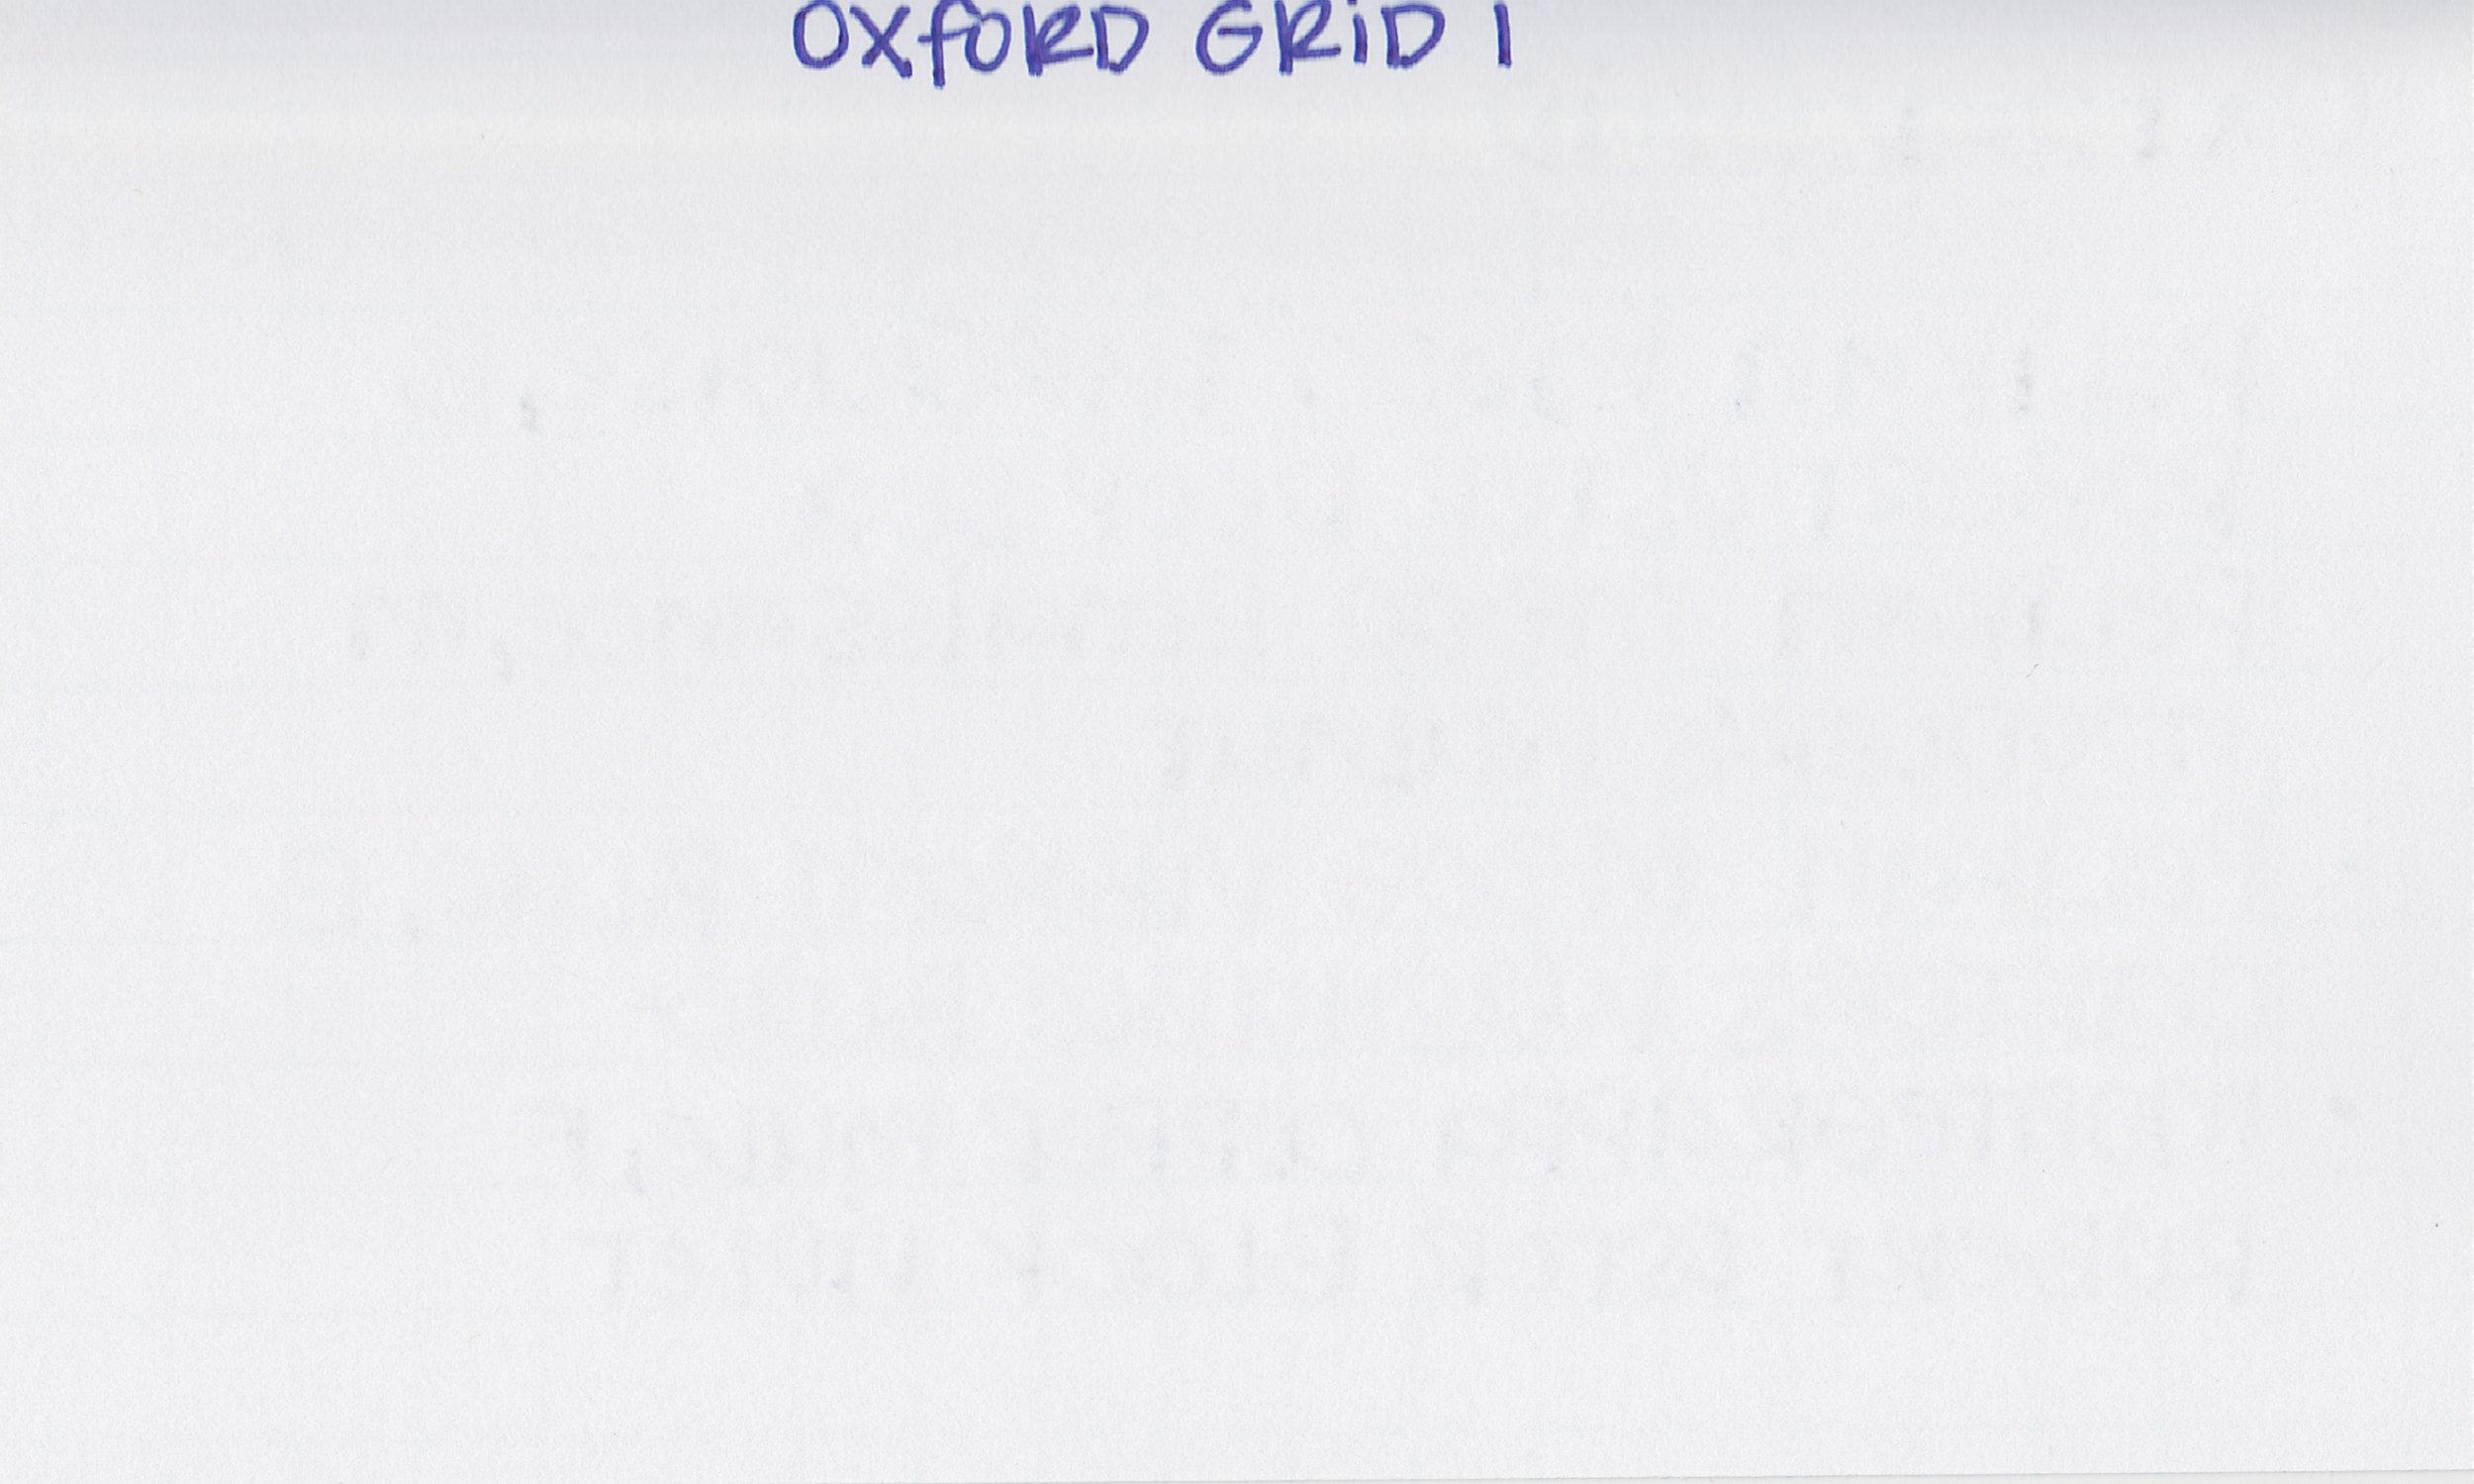 index-cards-2-26.jpg